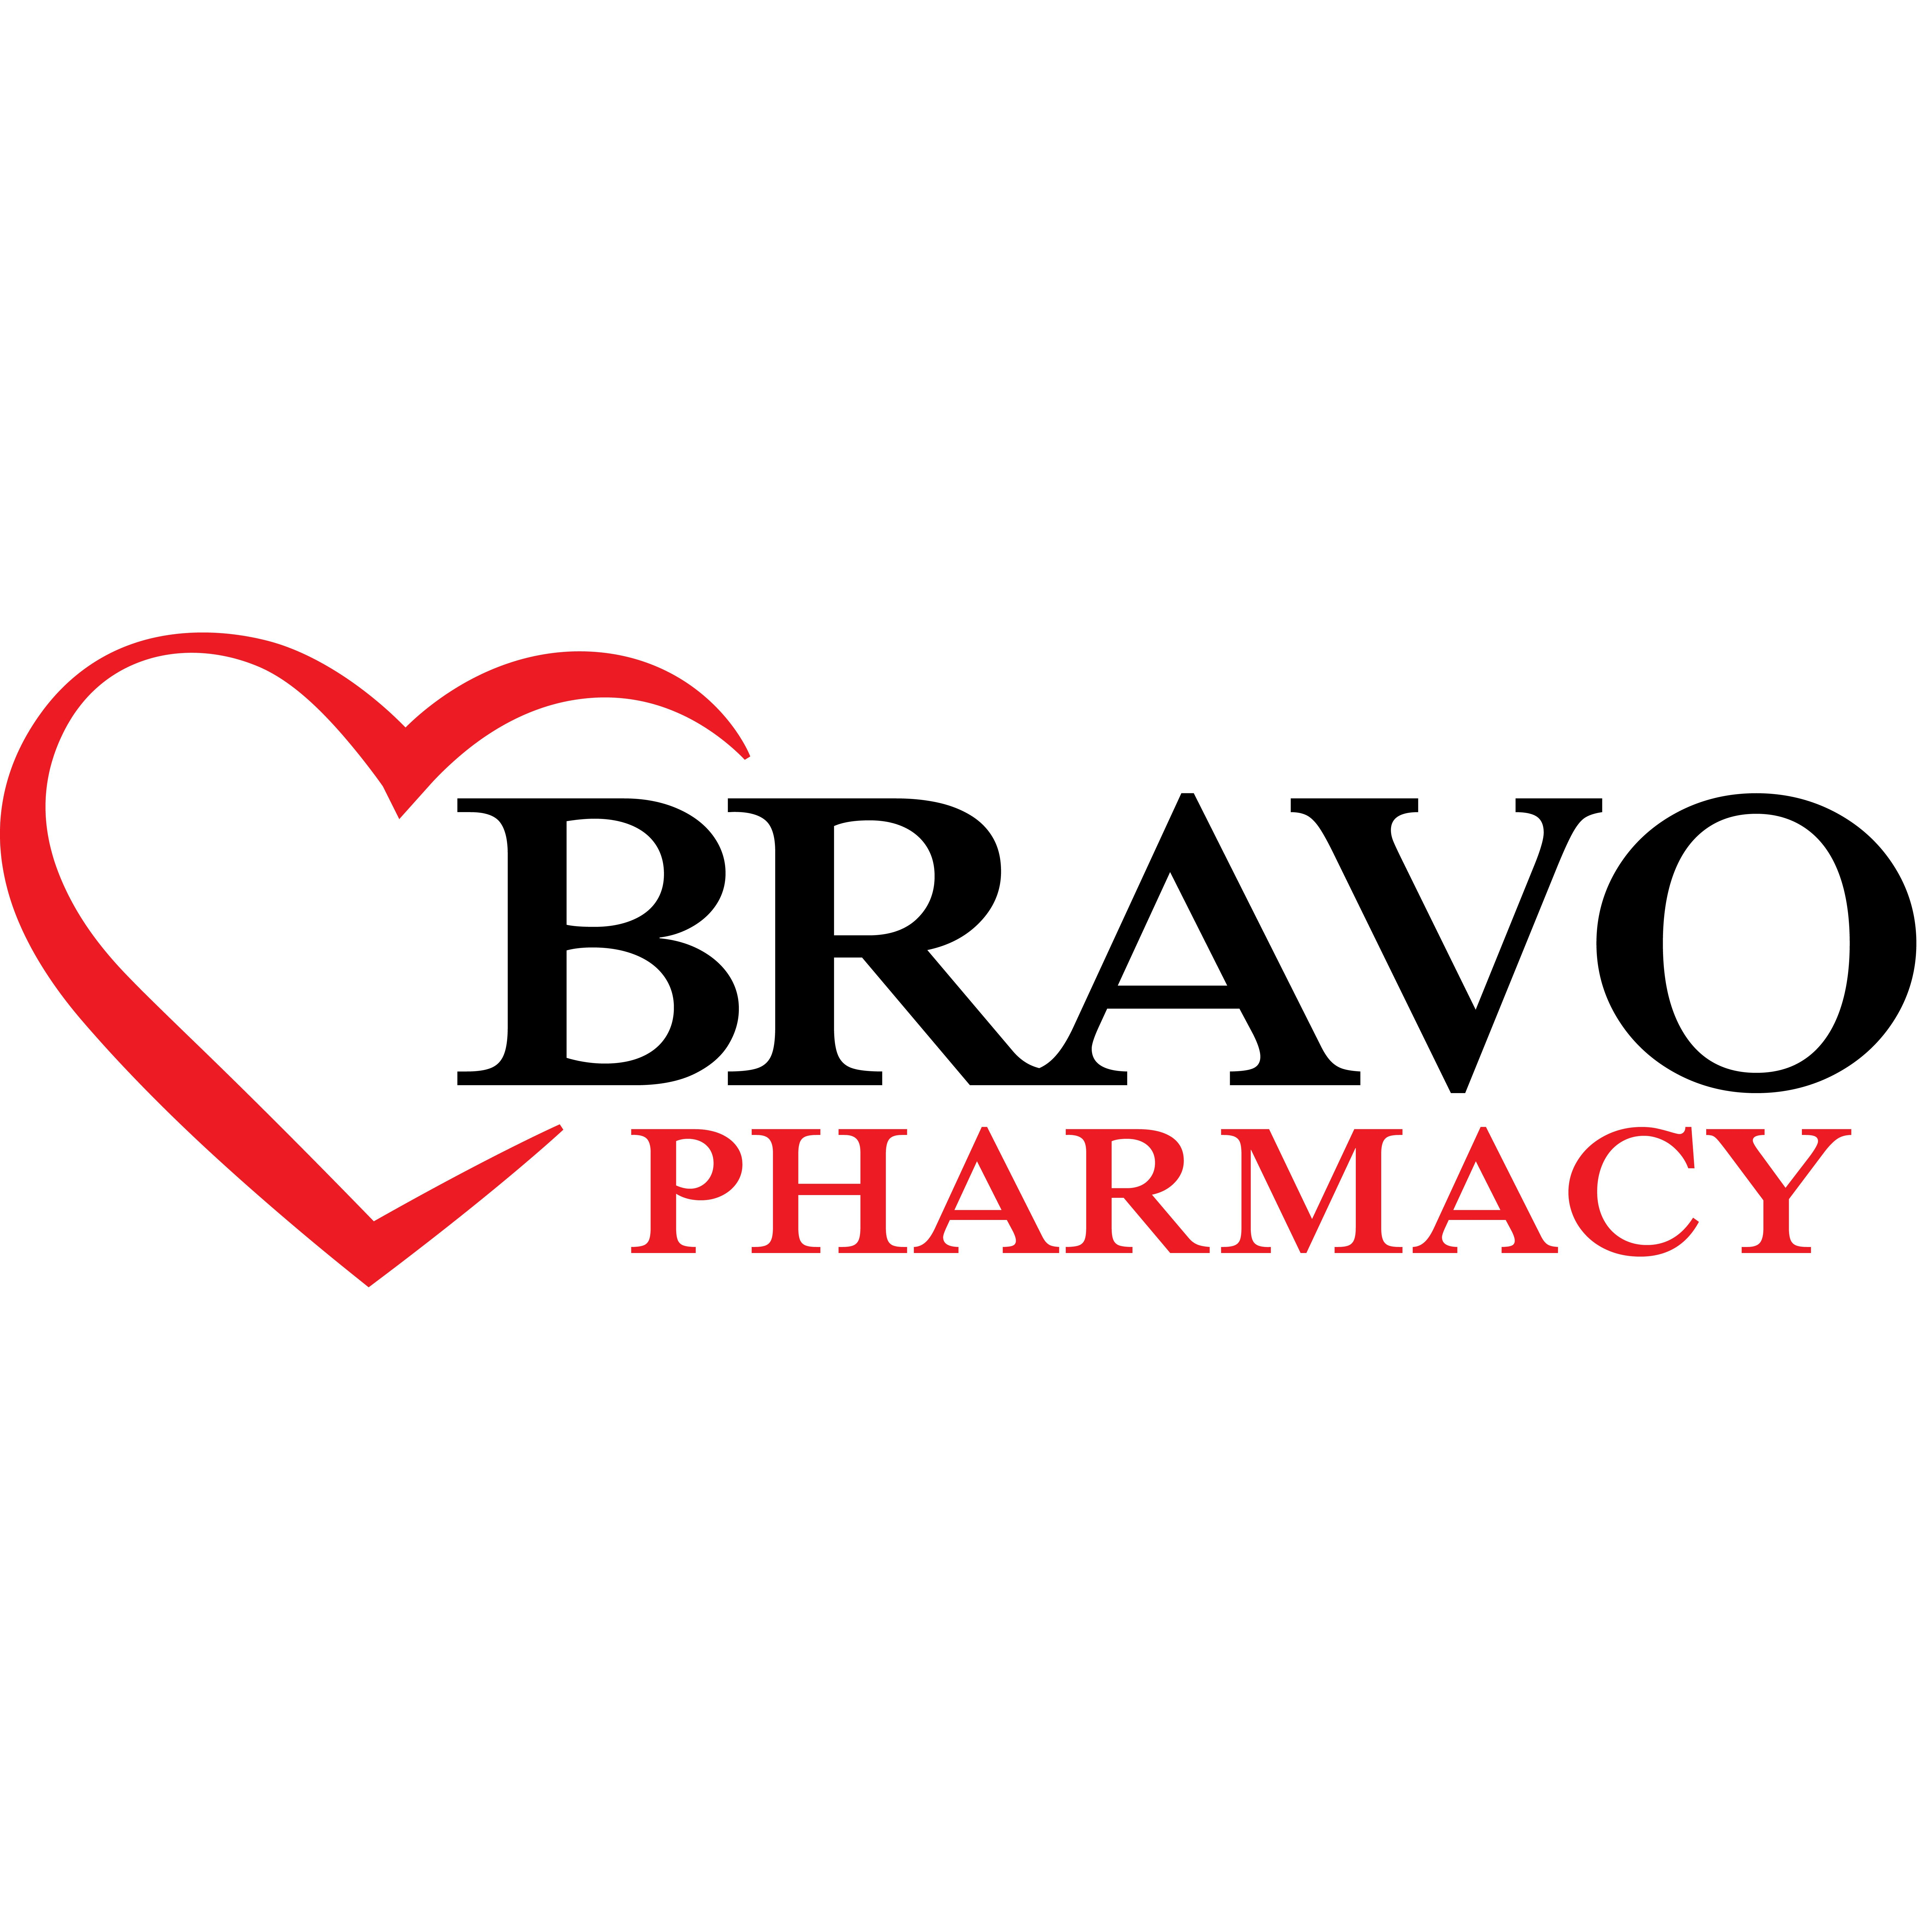 Bravo Pharmacy